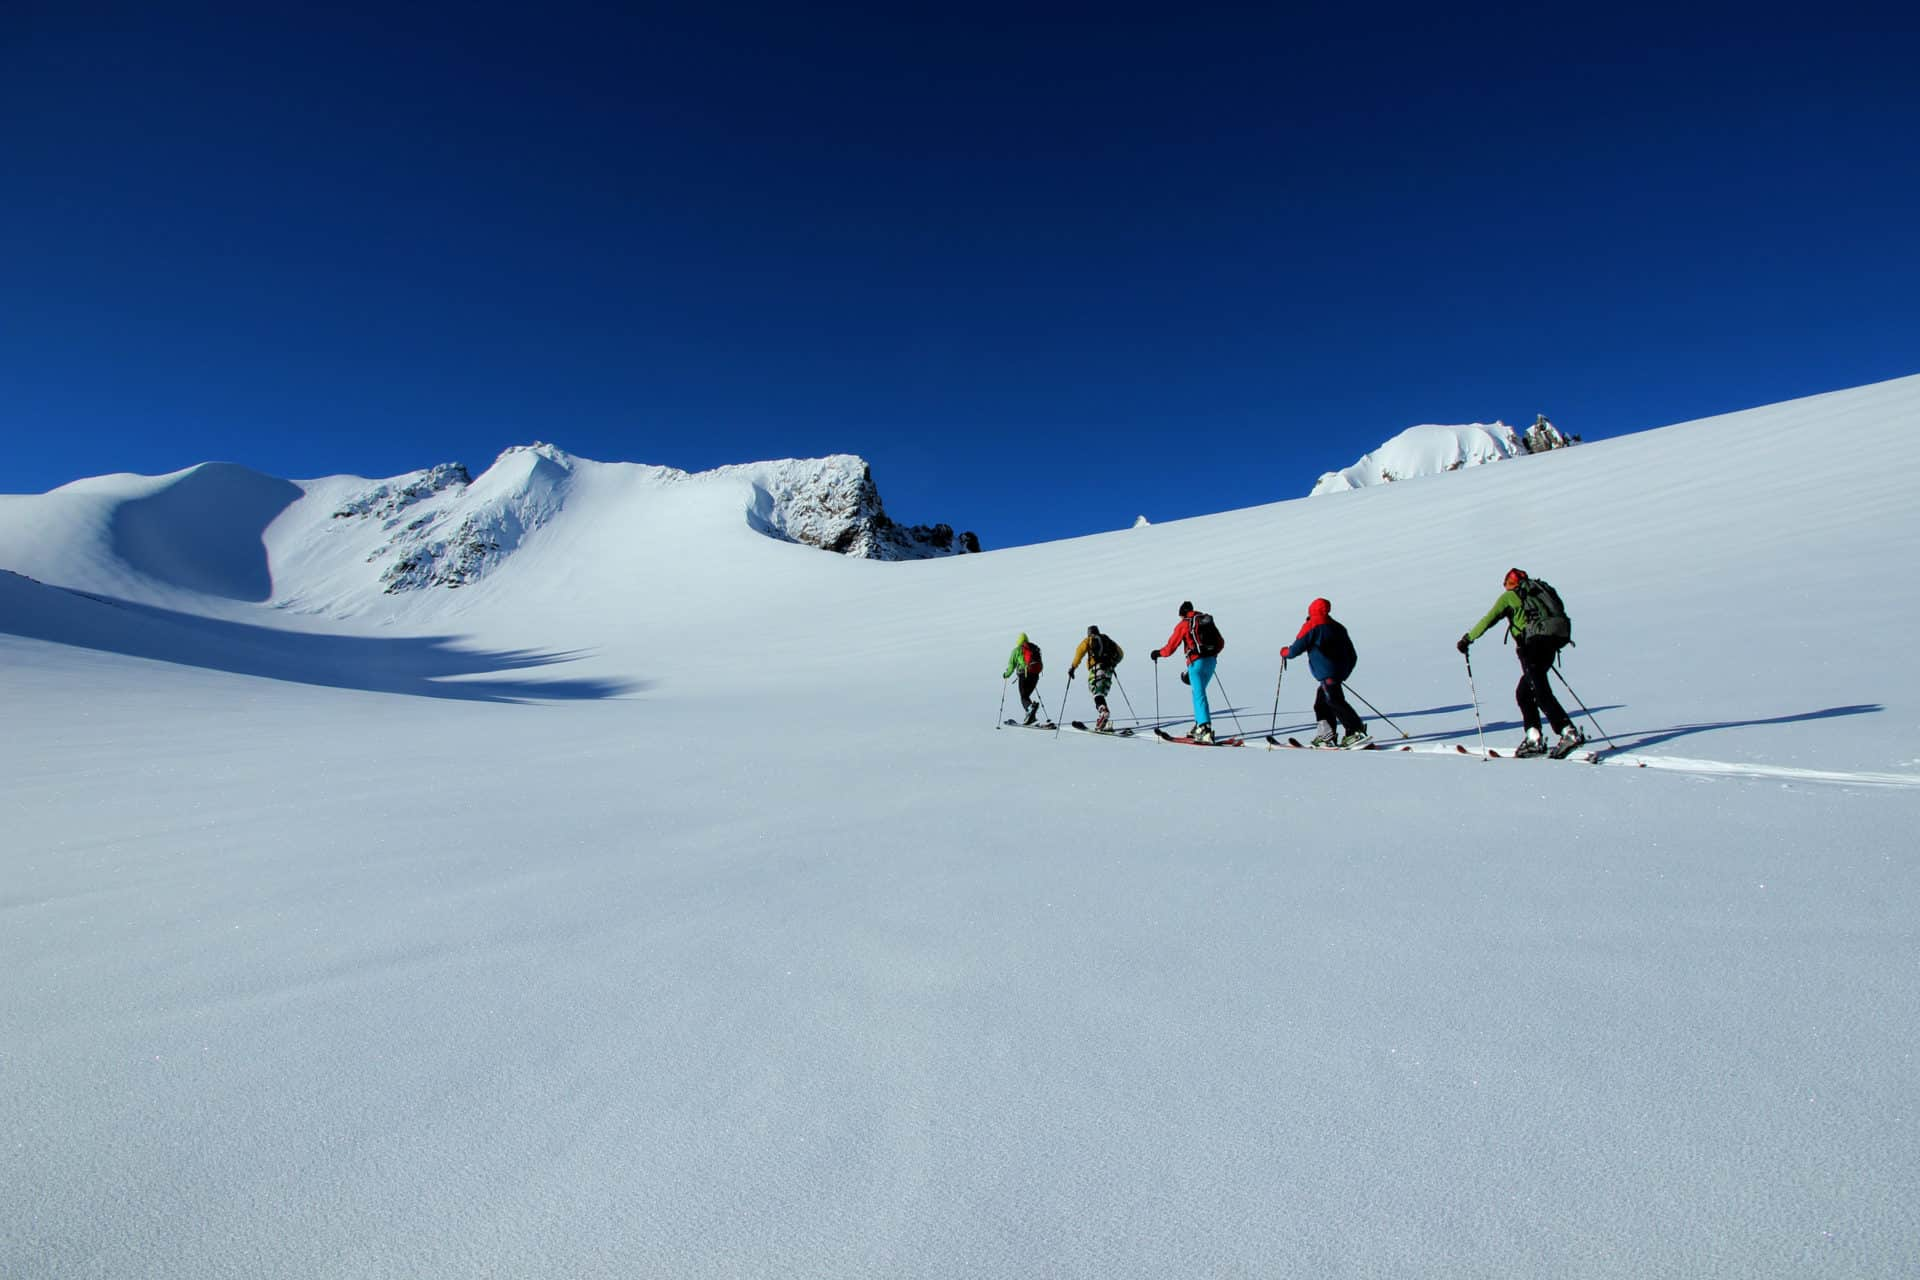 Ala Archa Glacier ski touring 6-day trip